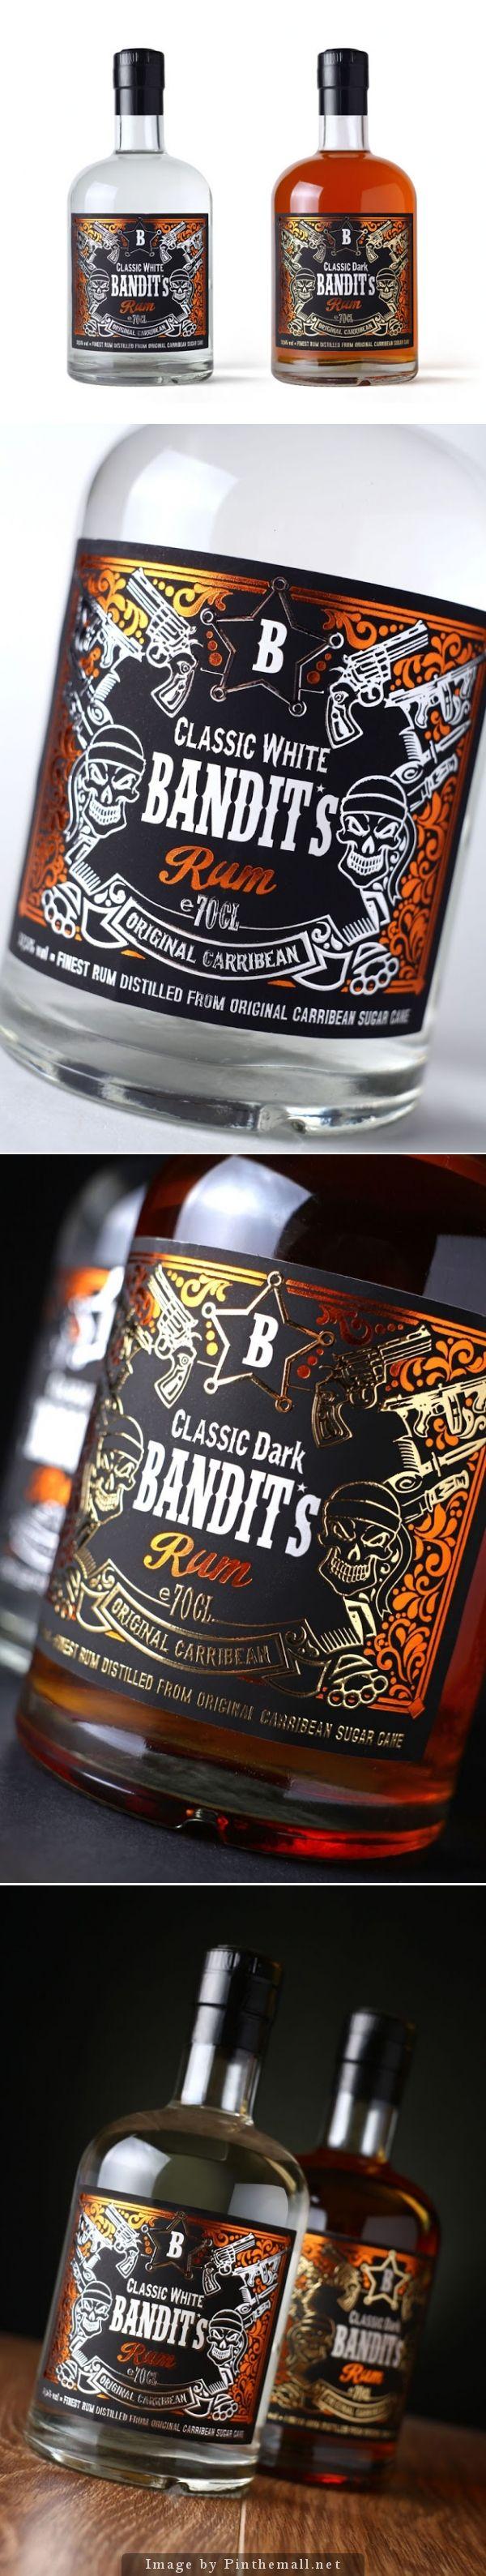 Bandit's Rum by  43'oz, Moldova